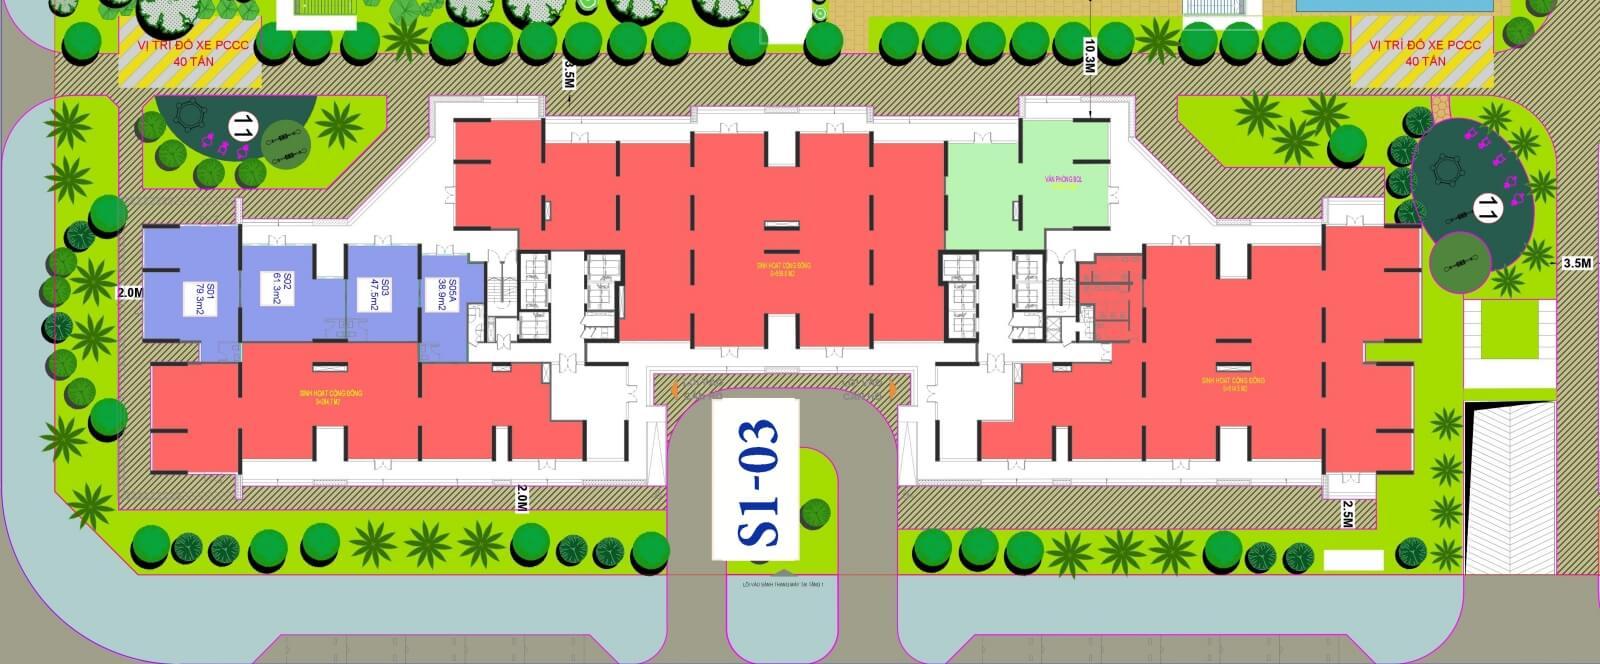 Mặt bằng toà S1 - 03 Shop Vinhomes Smart City Tây Mỗ